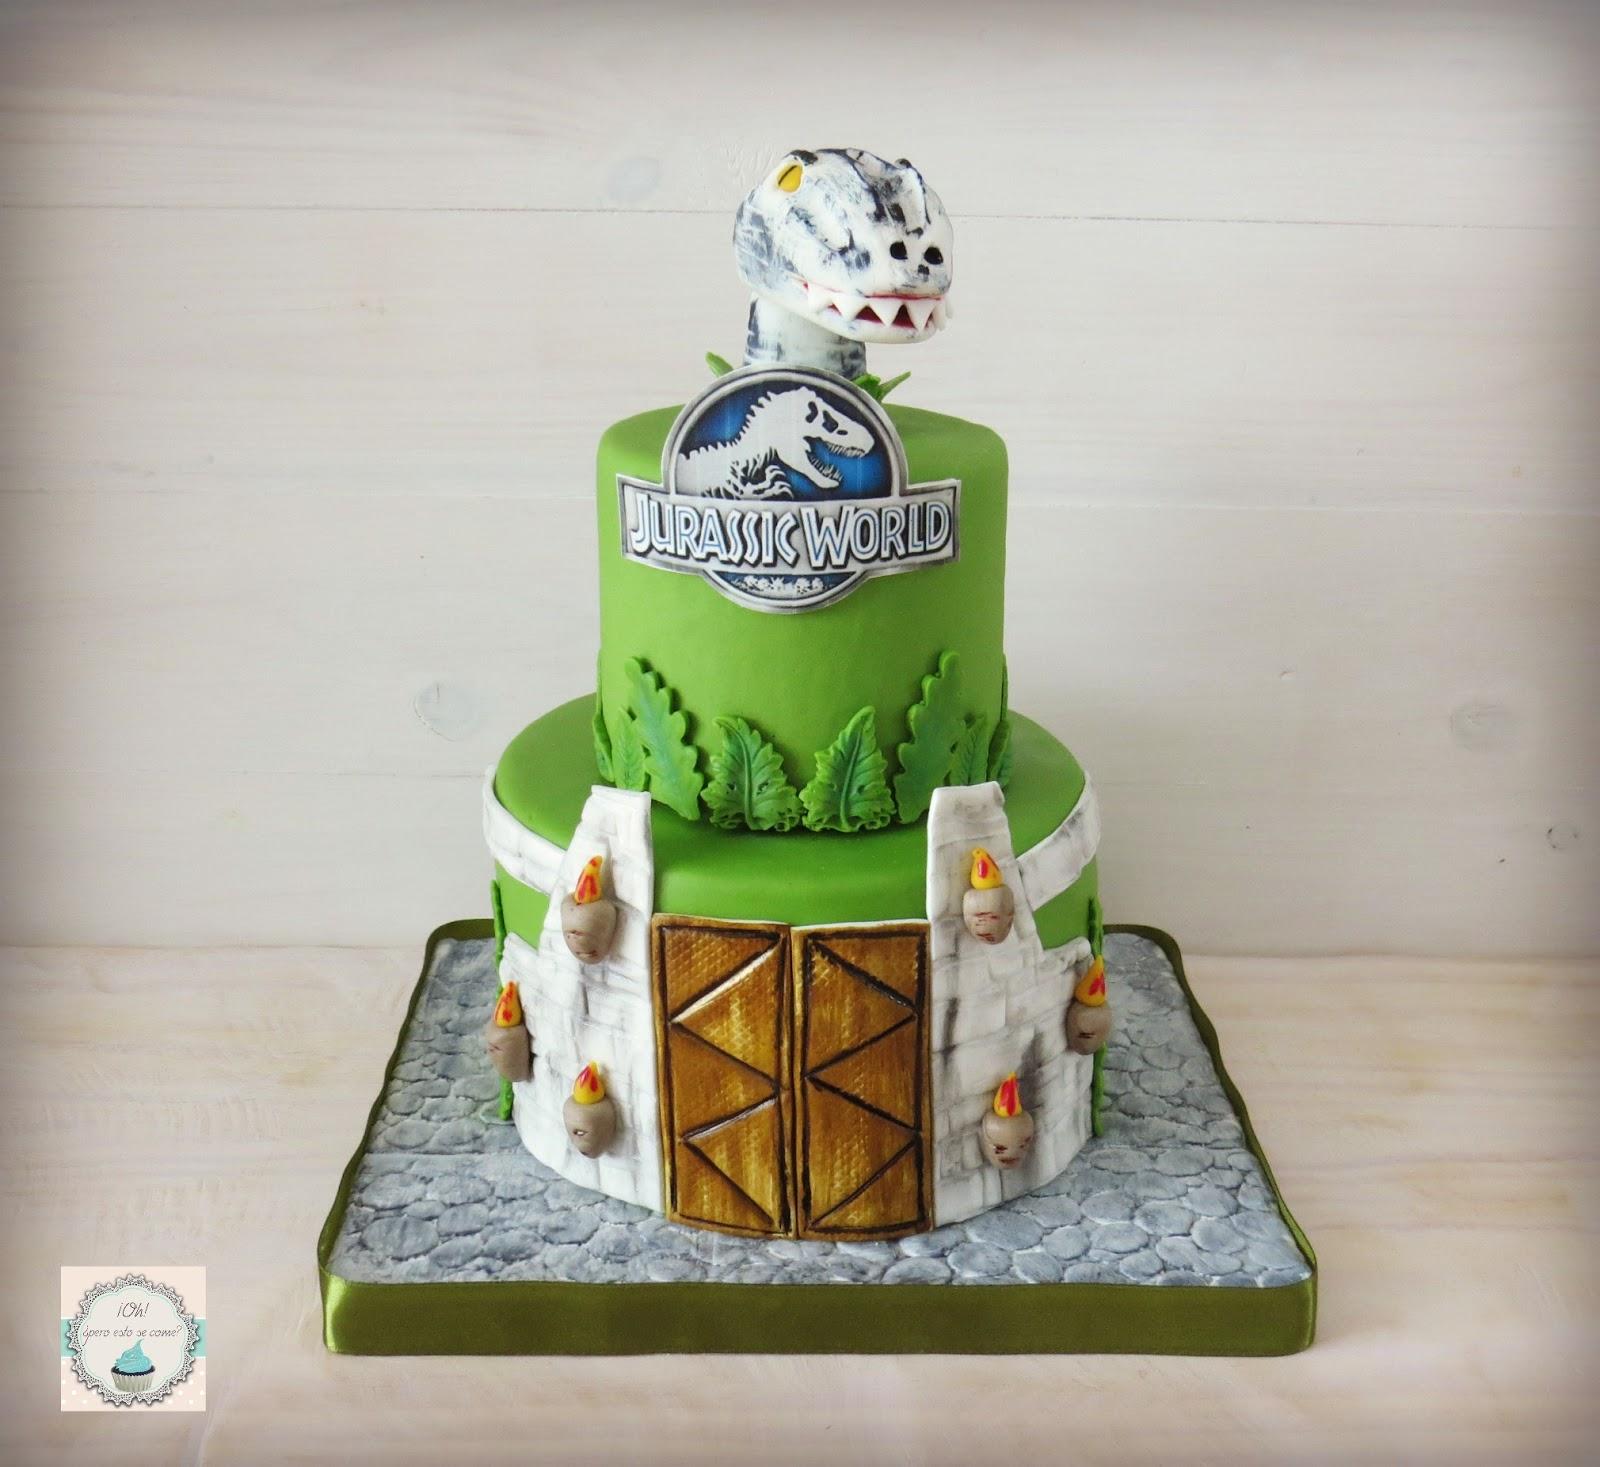 Lego Jurassic World Cake Images : Oh, ?pero esto se come?: Tarta Jurassic World